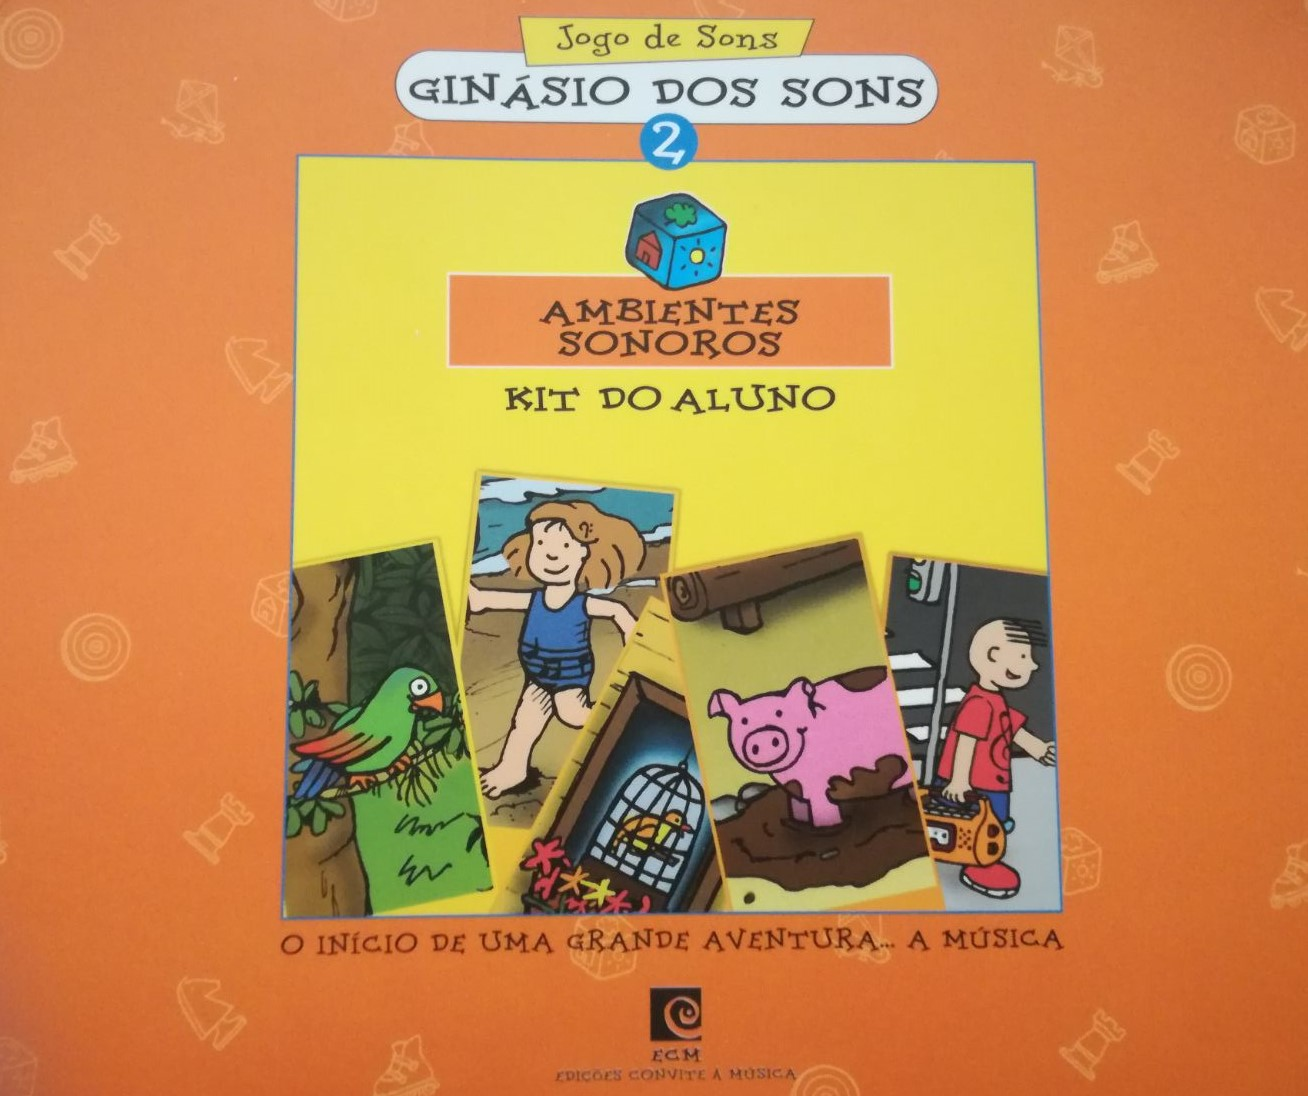 Ginásio dos Sons 2 - Ambientes sonoros (Livro+CD-Rom)